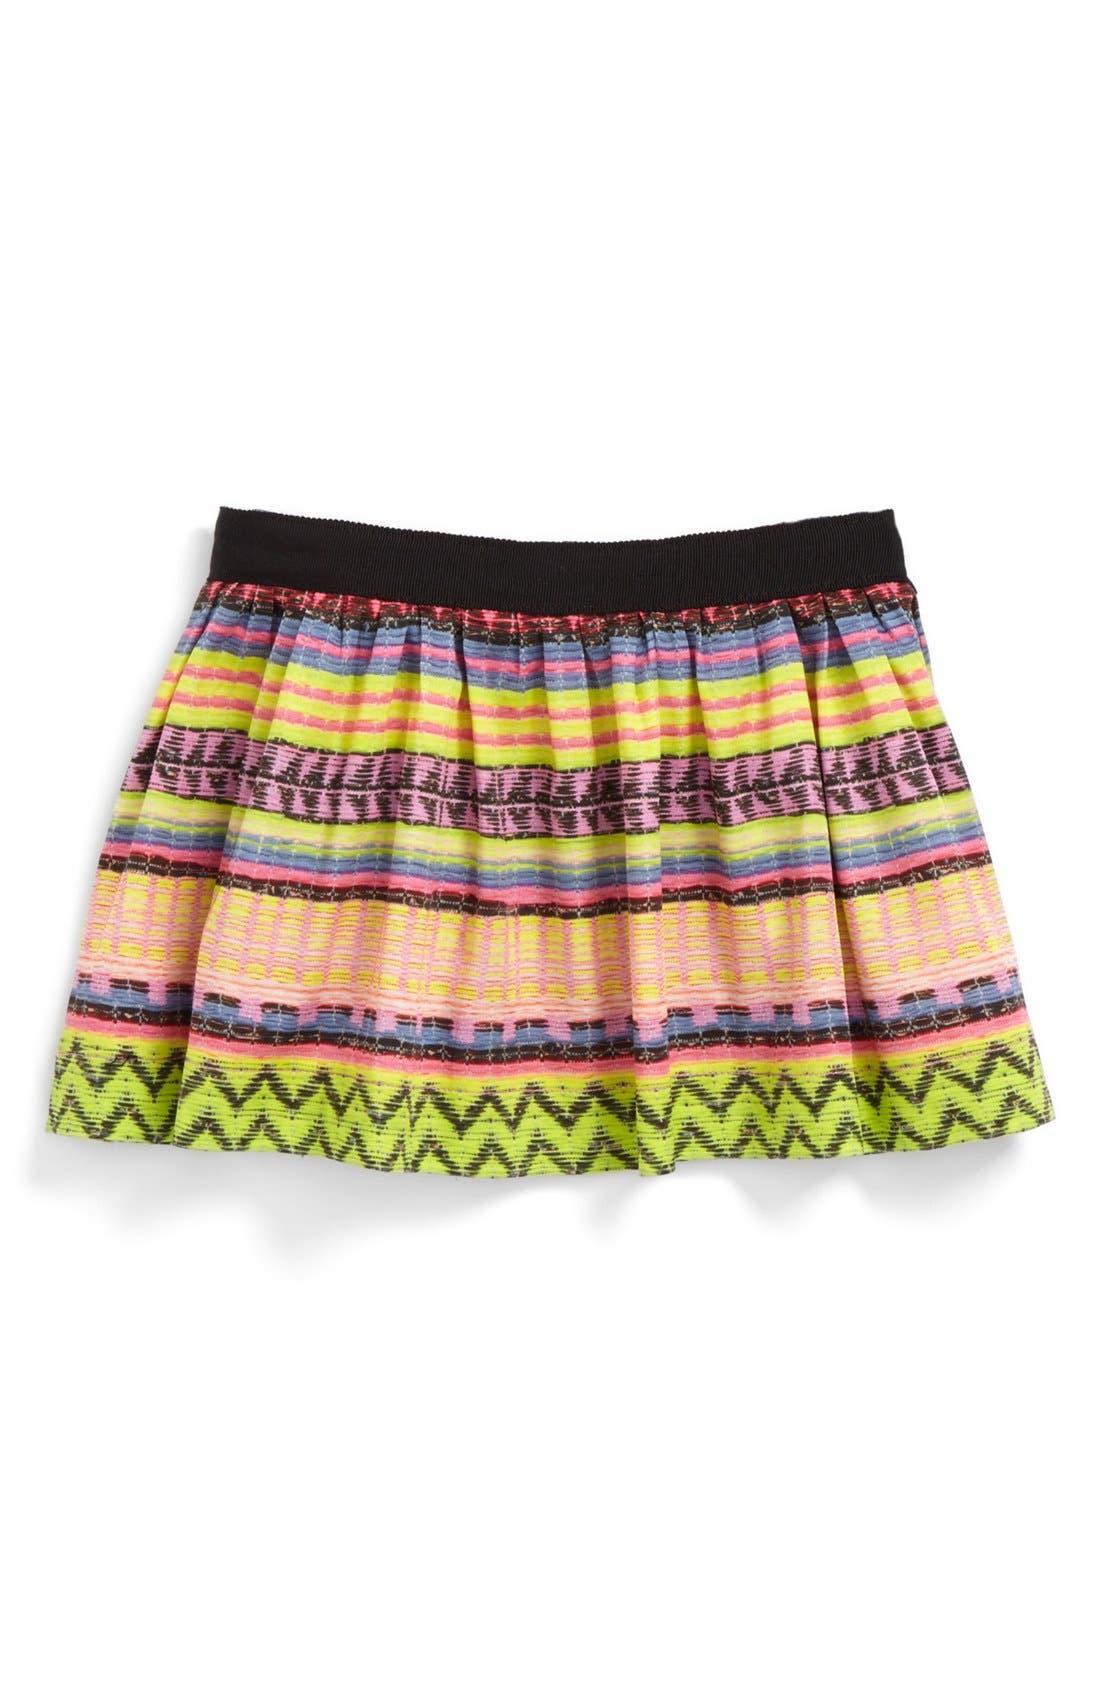 "Alternate Image 1 Selected - Milly Minis ""Raffia' Gathered Skirt (Toddler Girls, Little Girls & Big Girls)"